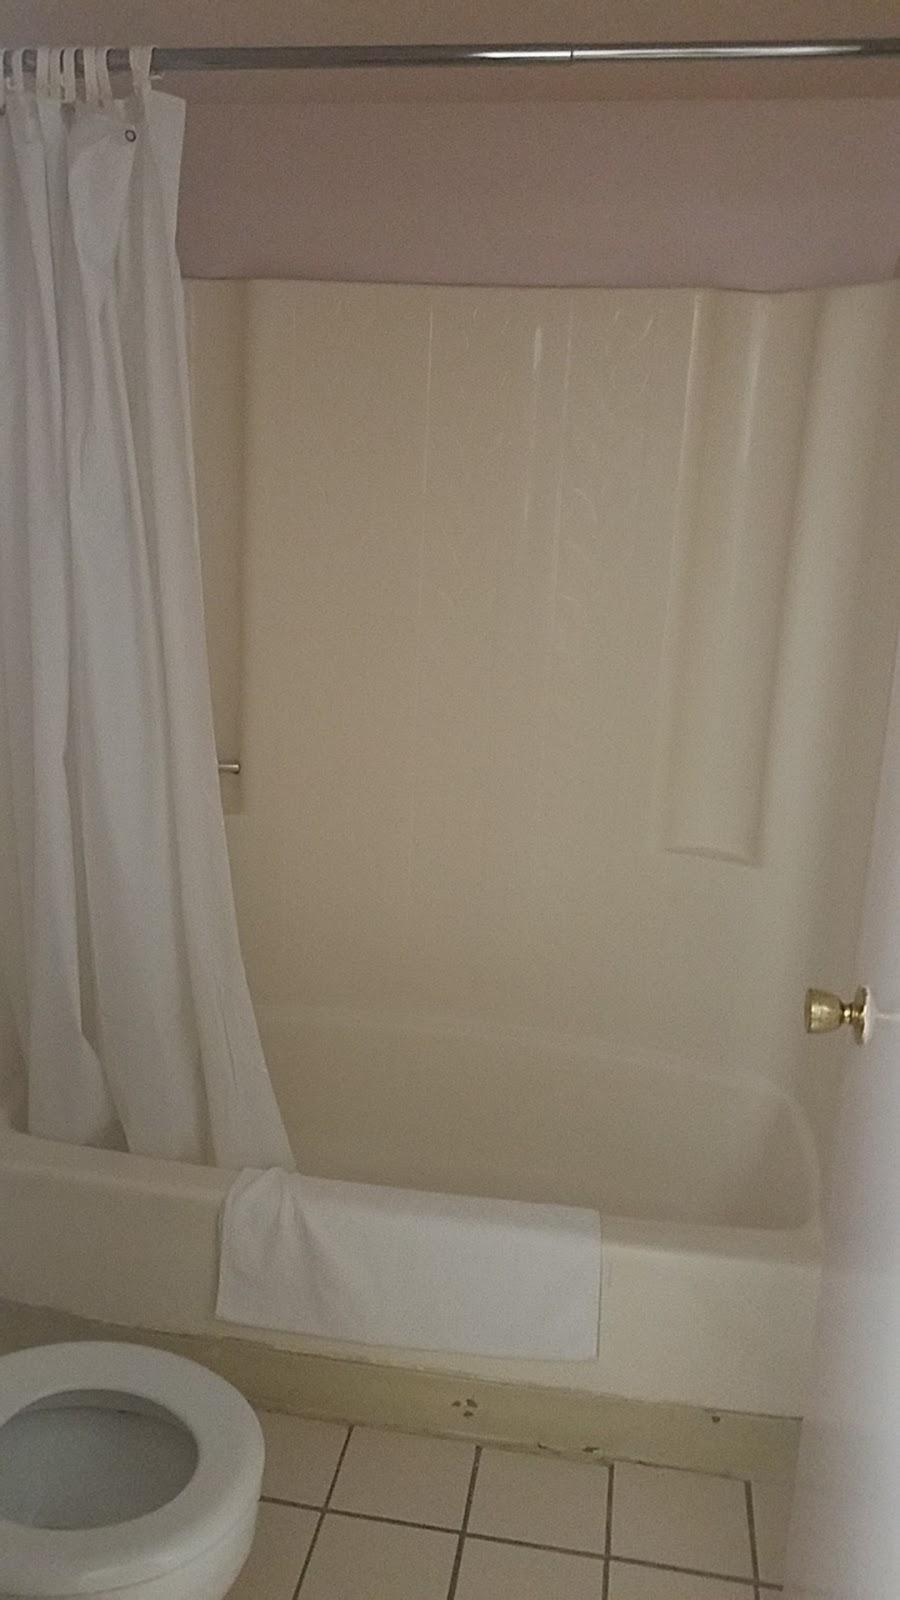 Enterprise Motel - lodging  | Photo 6 of 10 | Address: 4121 W Vine St, Kissimmee, FL 34741, USA | Phone: (407) 933-1383